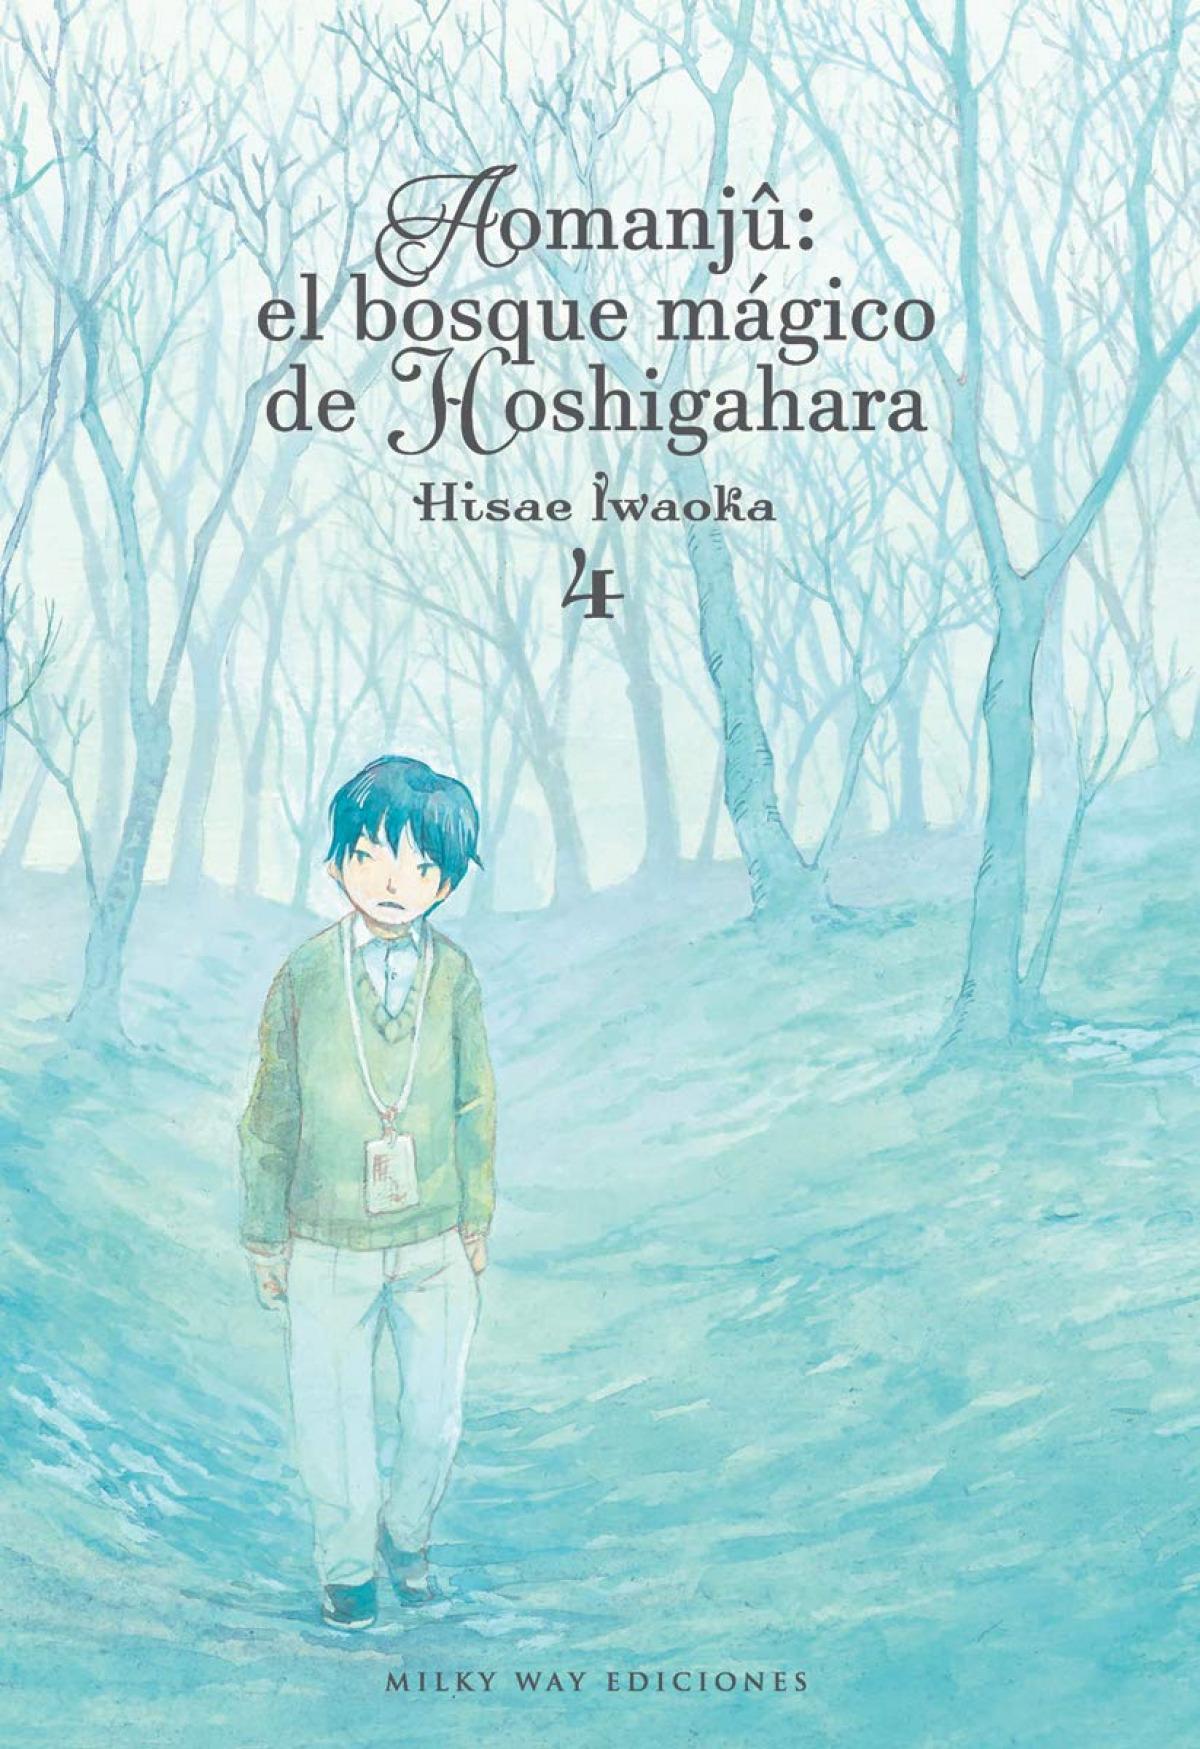 AOMANJÛ: EL BOSQUE MAGICO DE HOSHIGAHARA 4